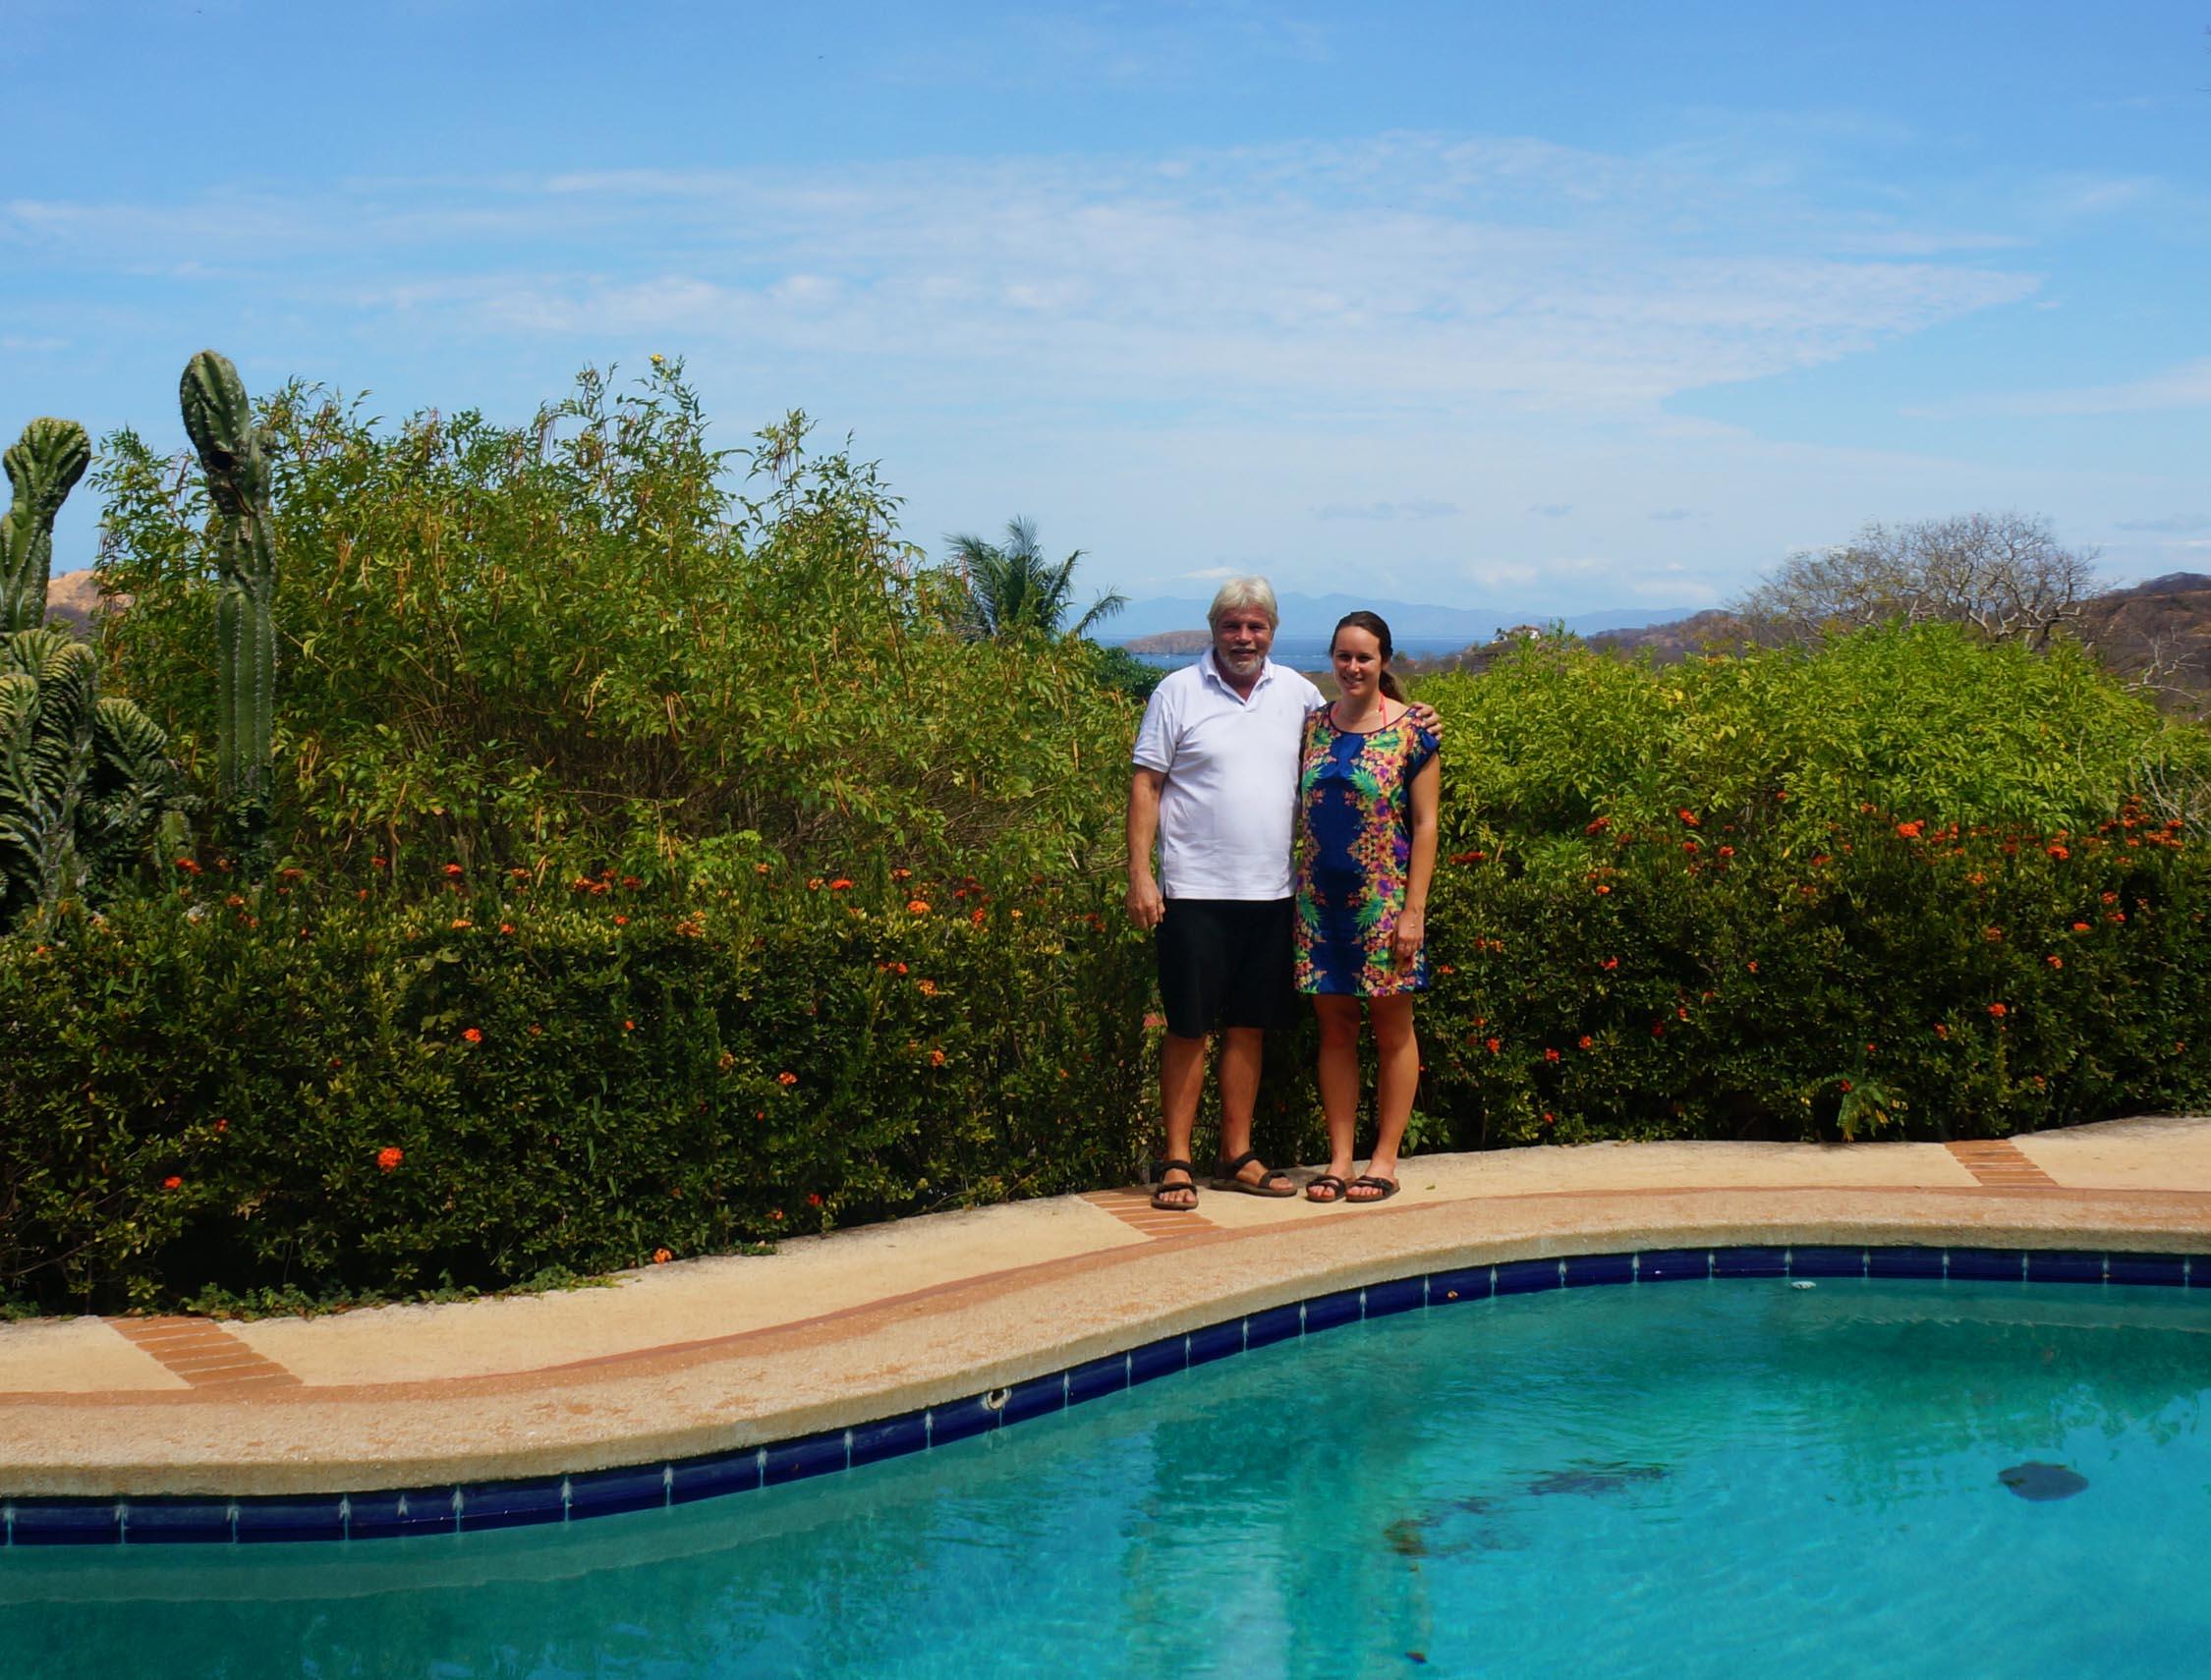 Ocean Views and Starry Skies at Rancho Armadillo Estate in Playas del Coco